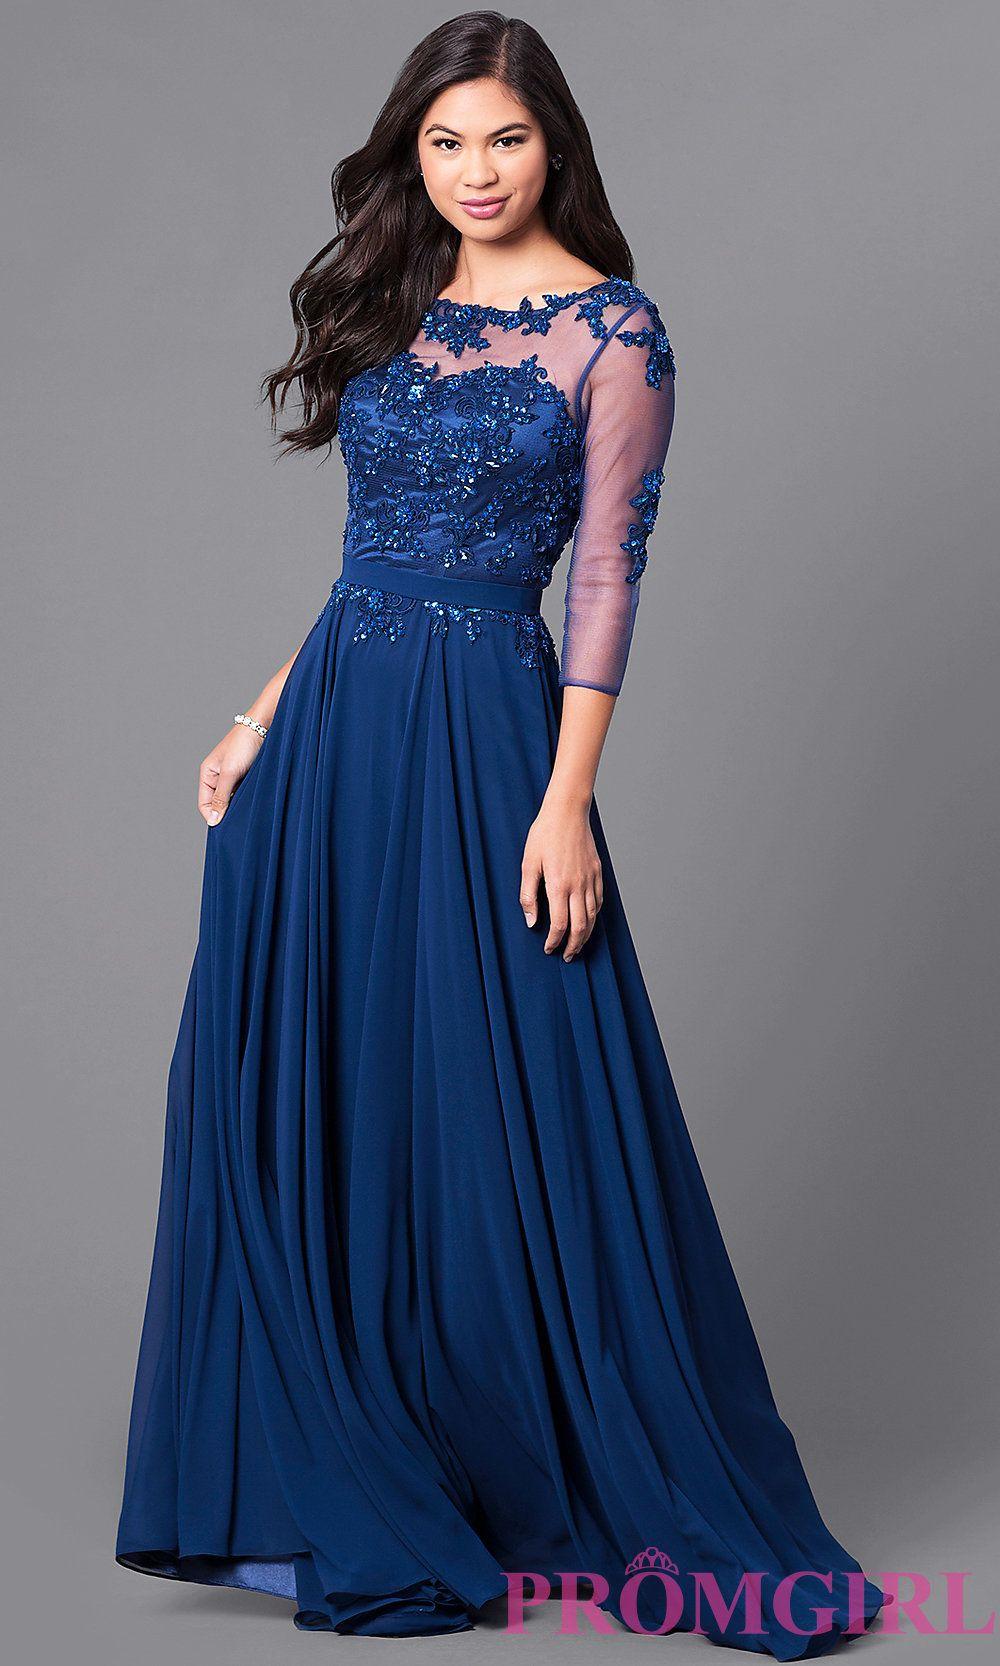 a735a10e93f Cheap Prom Dresses Under 200